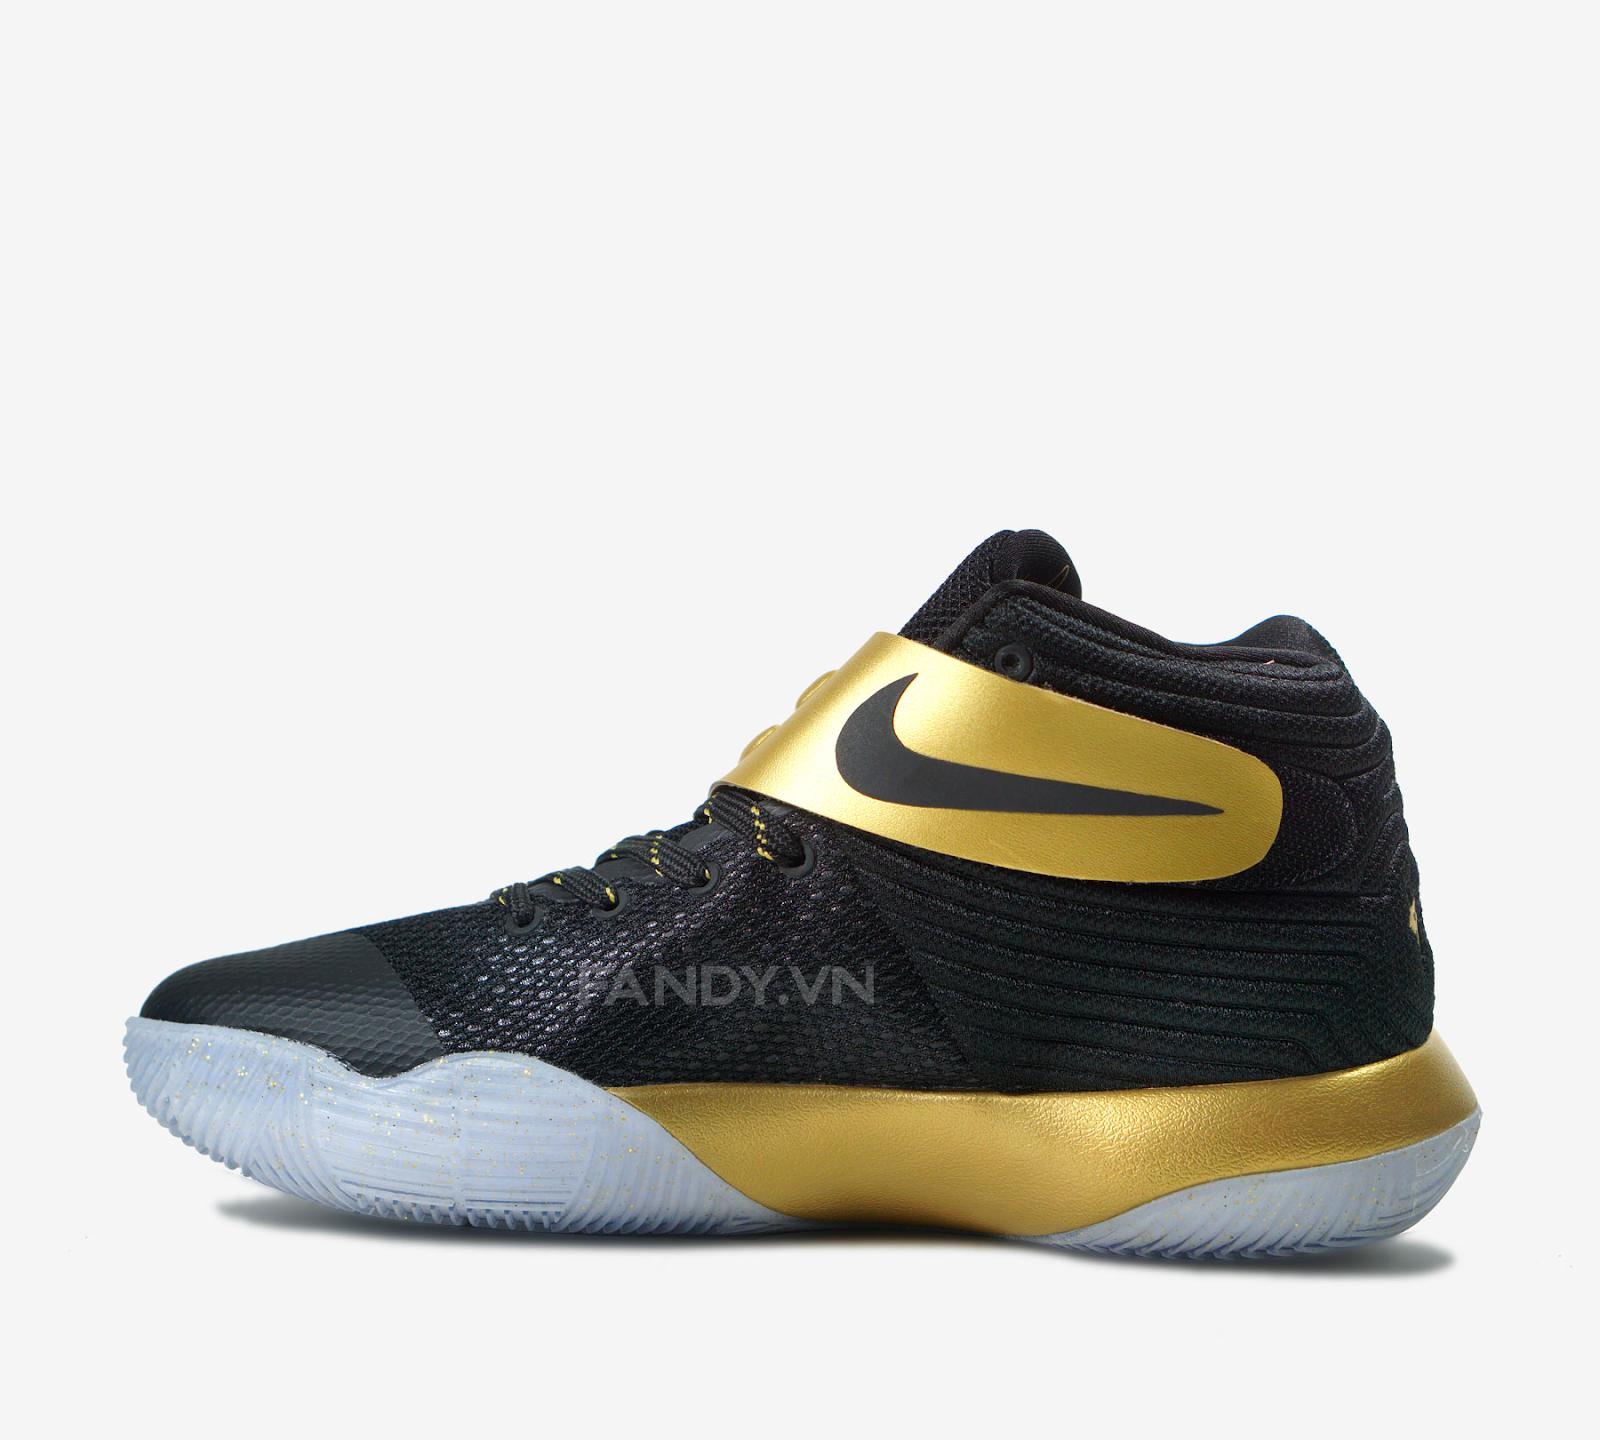 Giày Nike Kyrie 2 Black/Gold